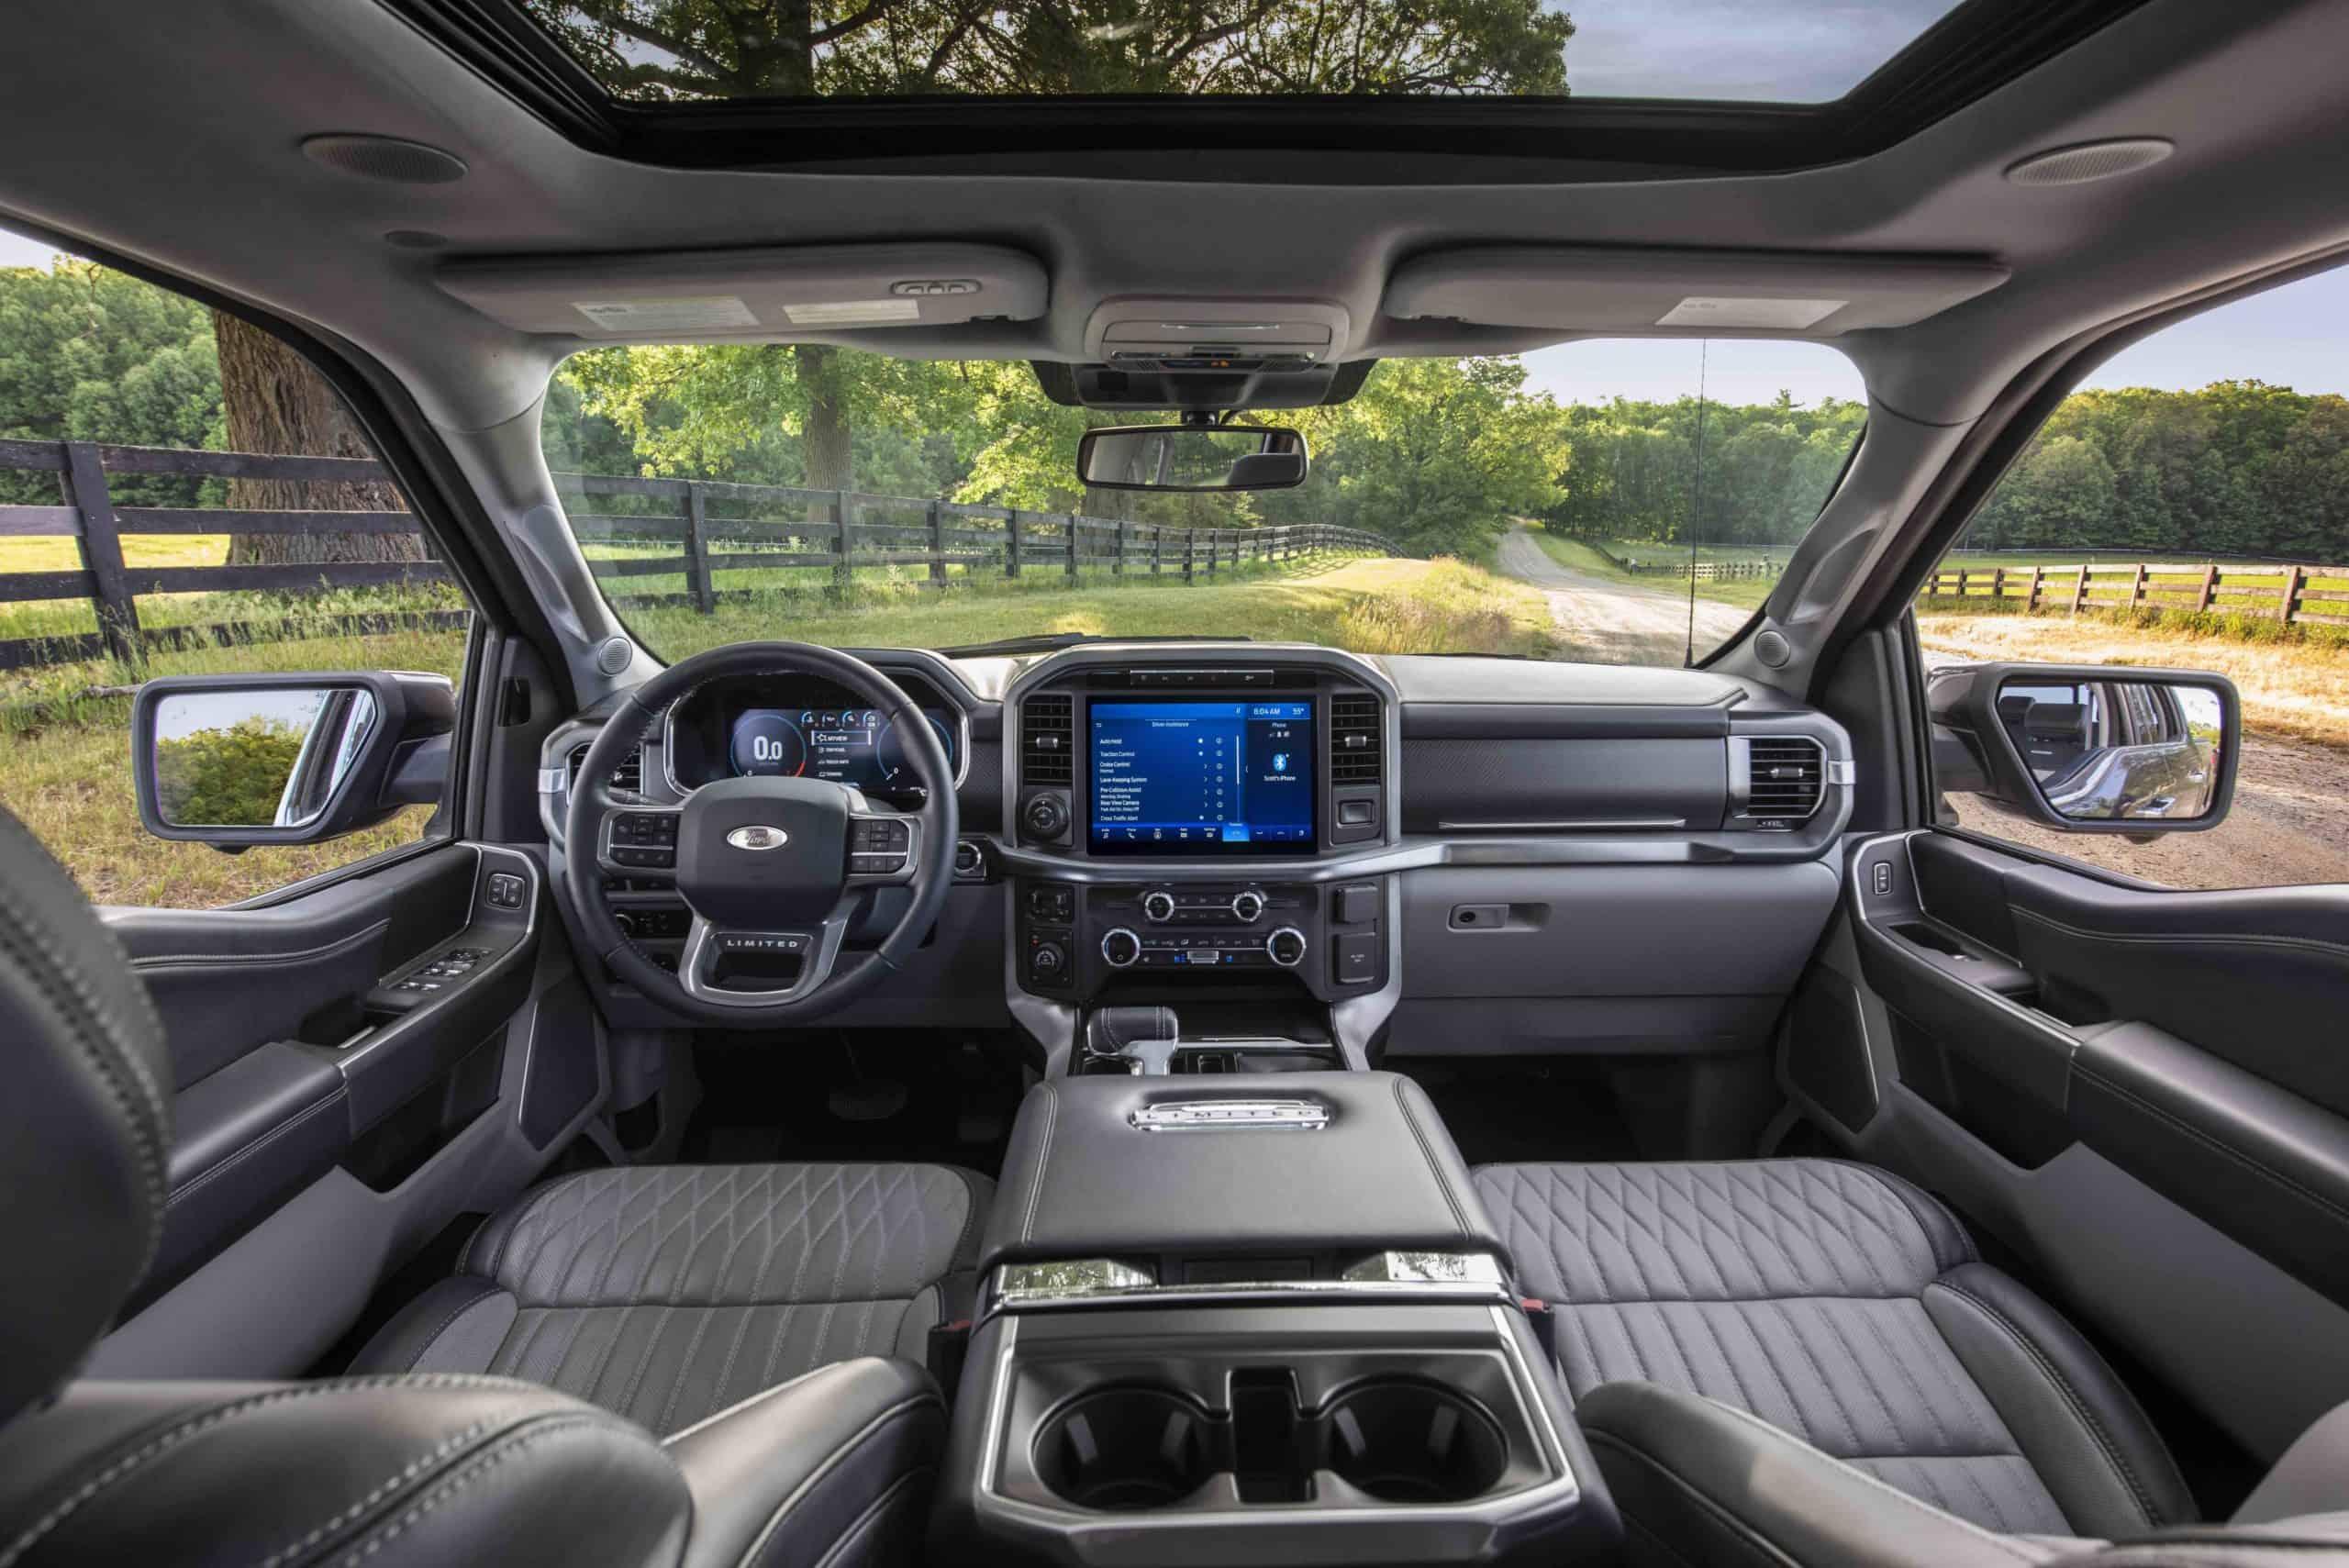 2021 F-150 Interior